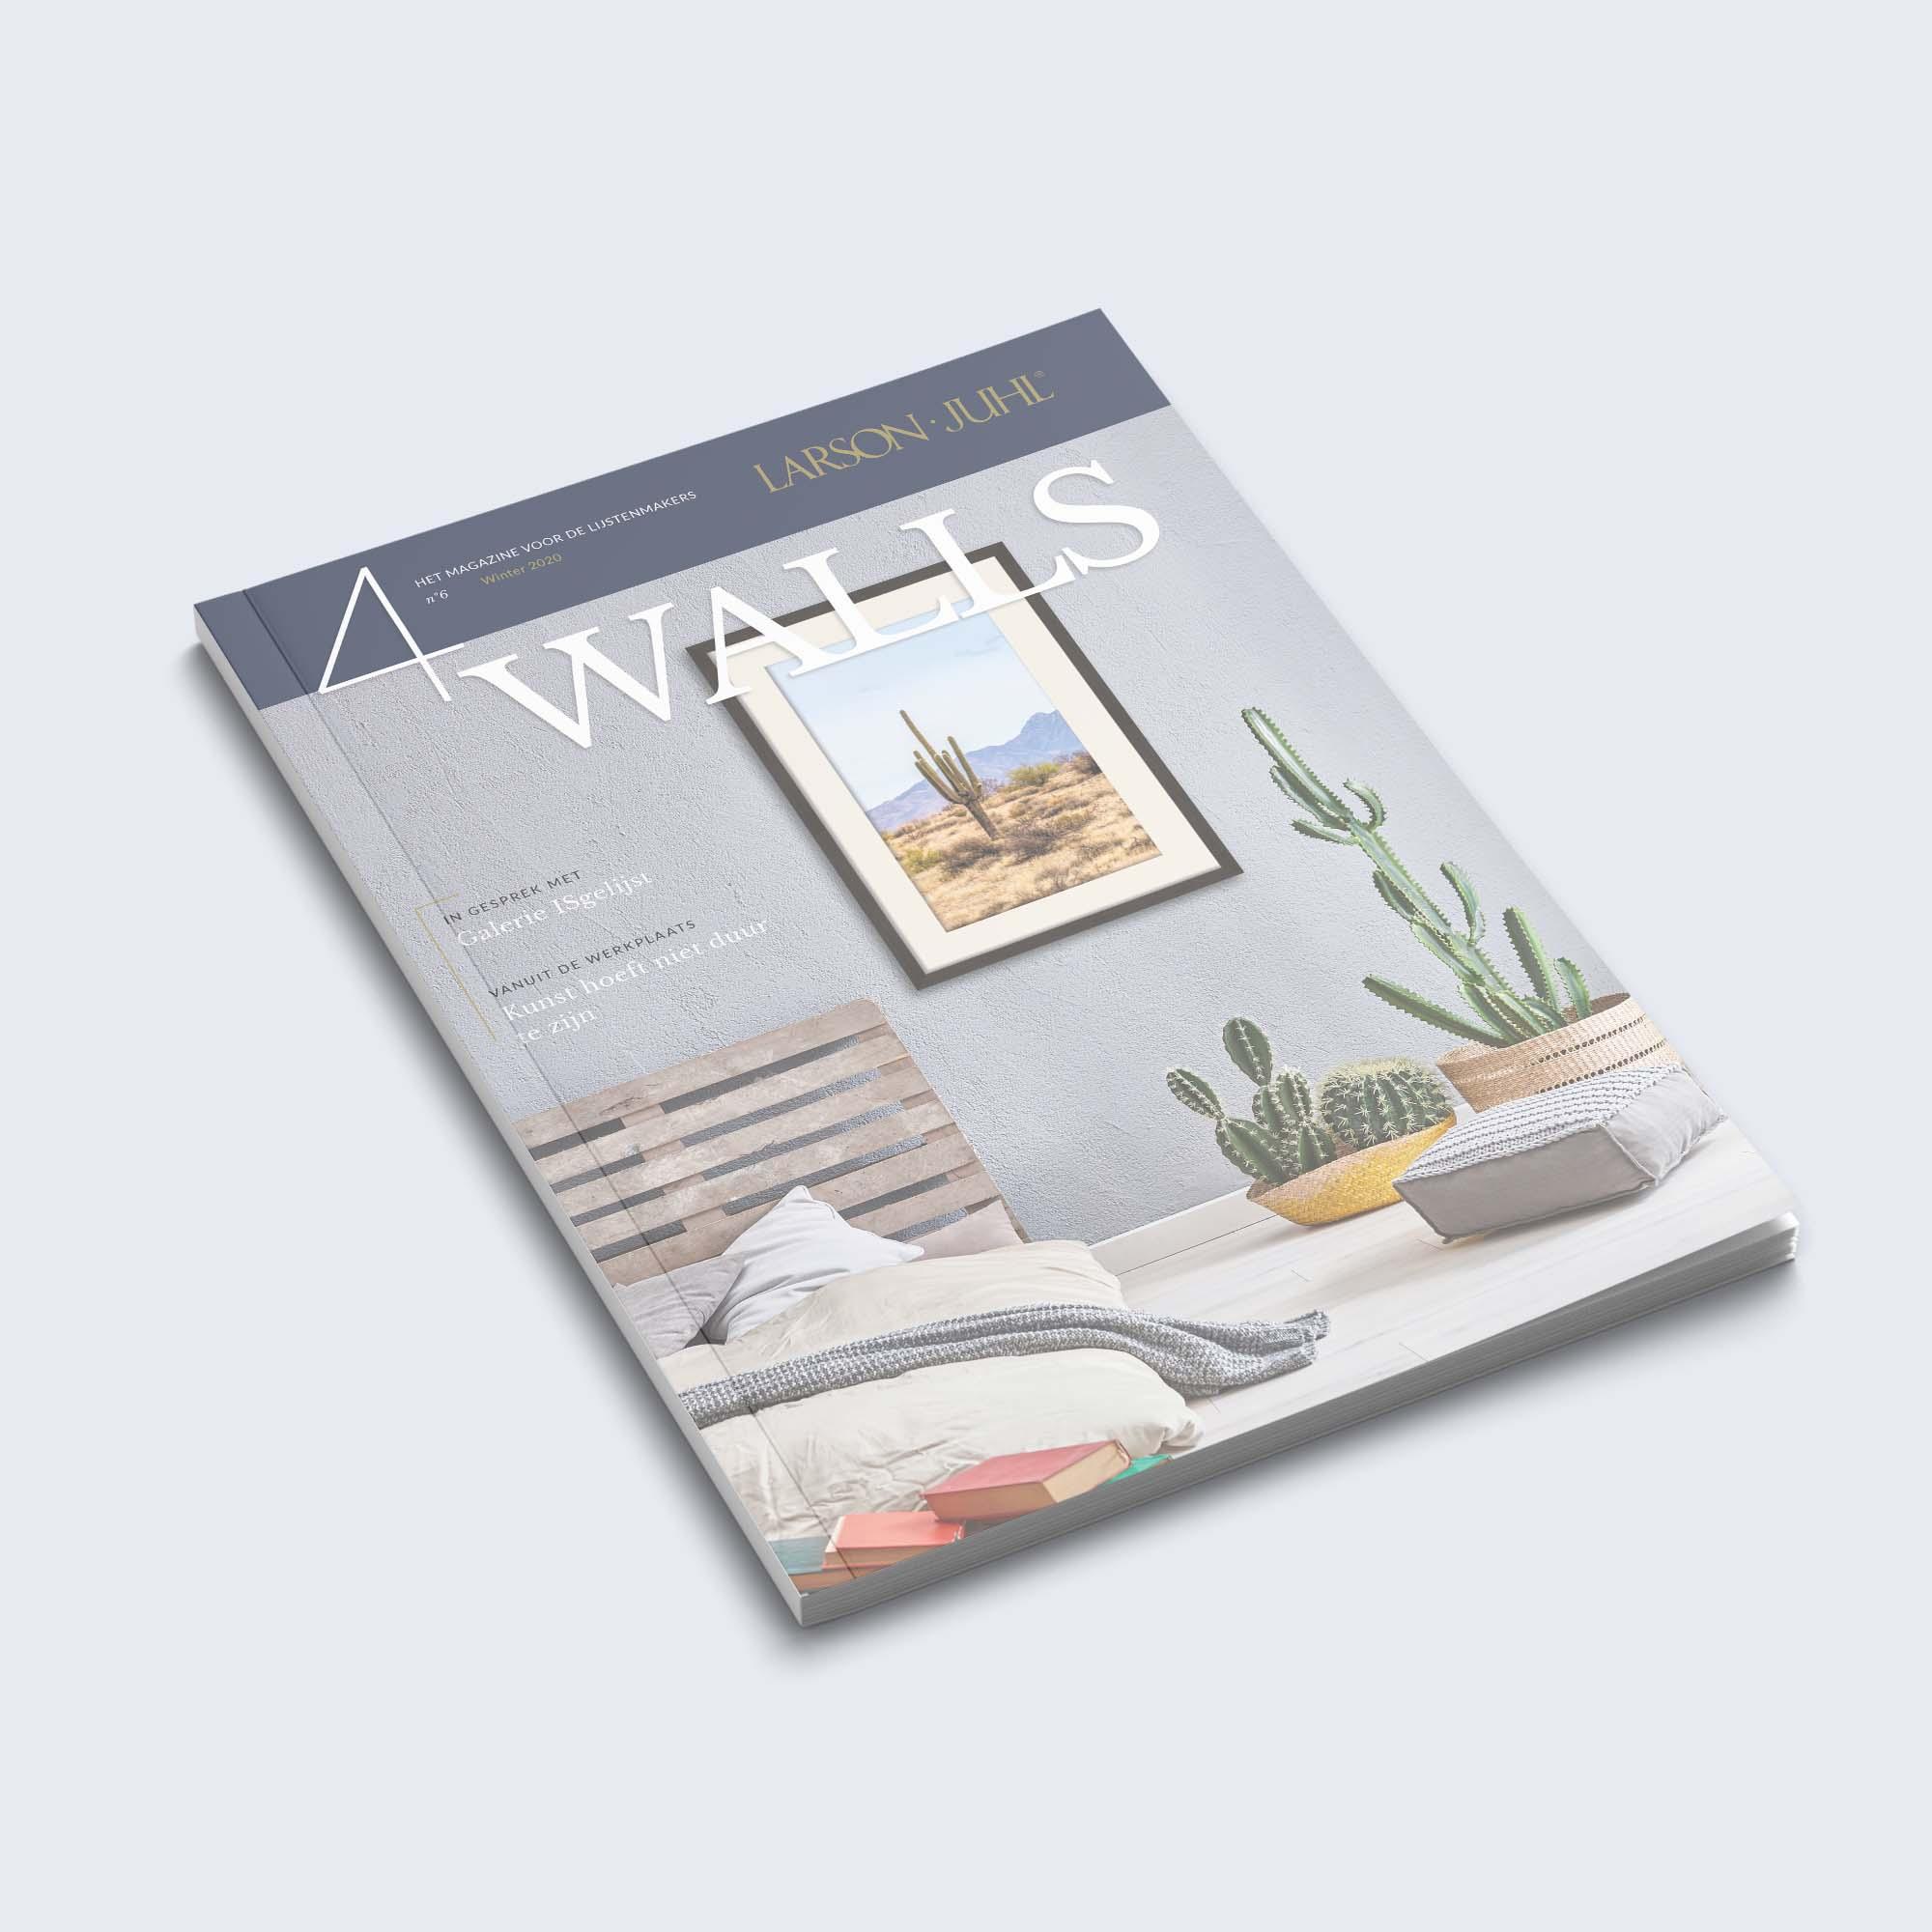 Magazine vormgeving - 4Walls - Dots & Lines - grafische vormgeving Tilburg